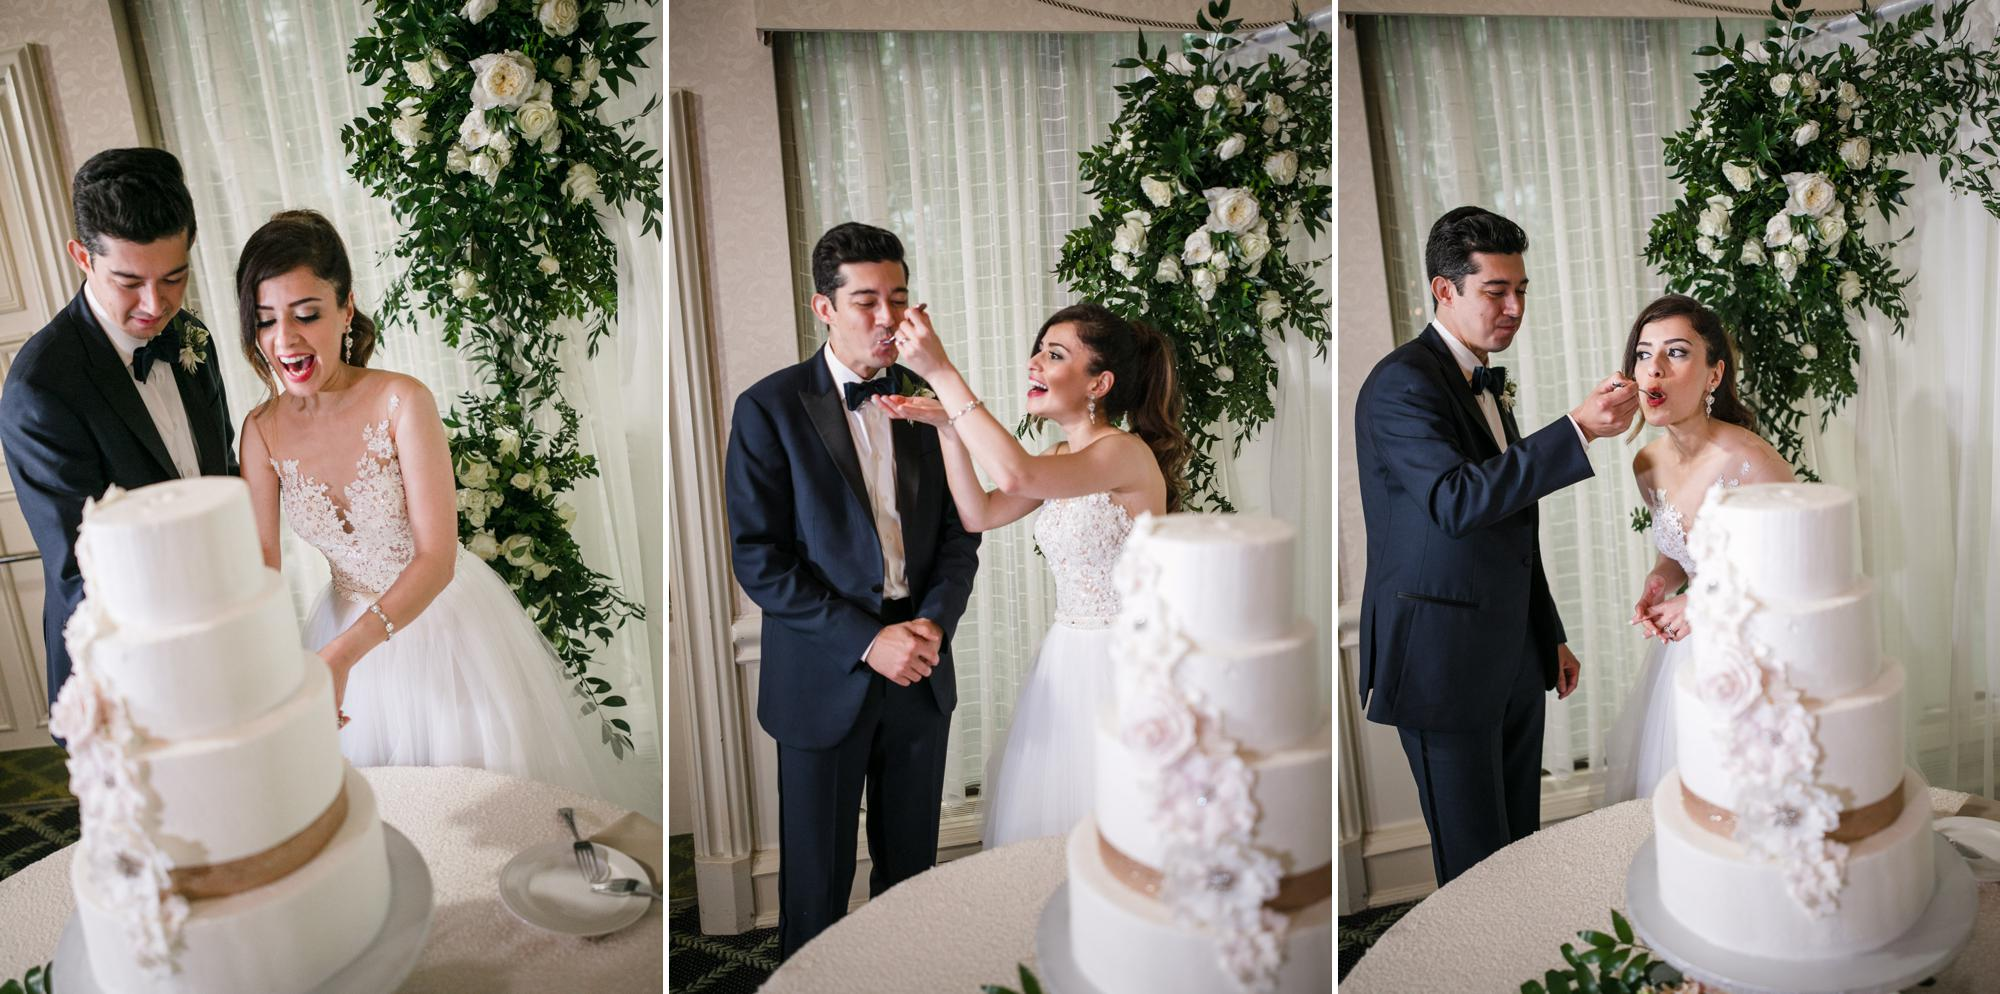 sylvania-country-club-wedding-photos-195.jpg